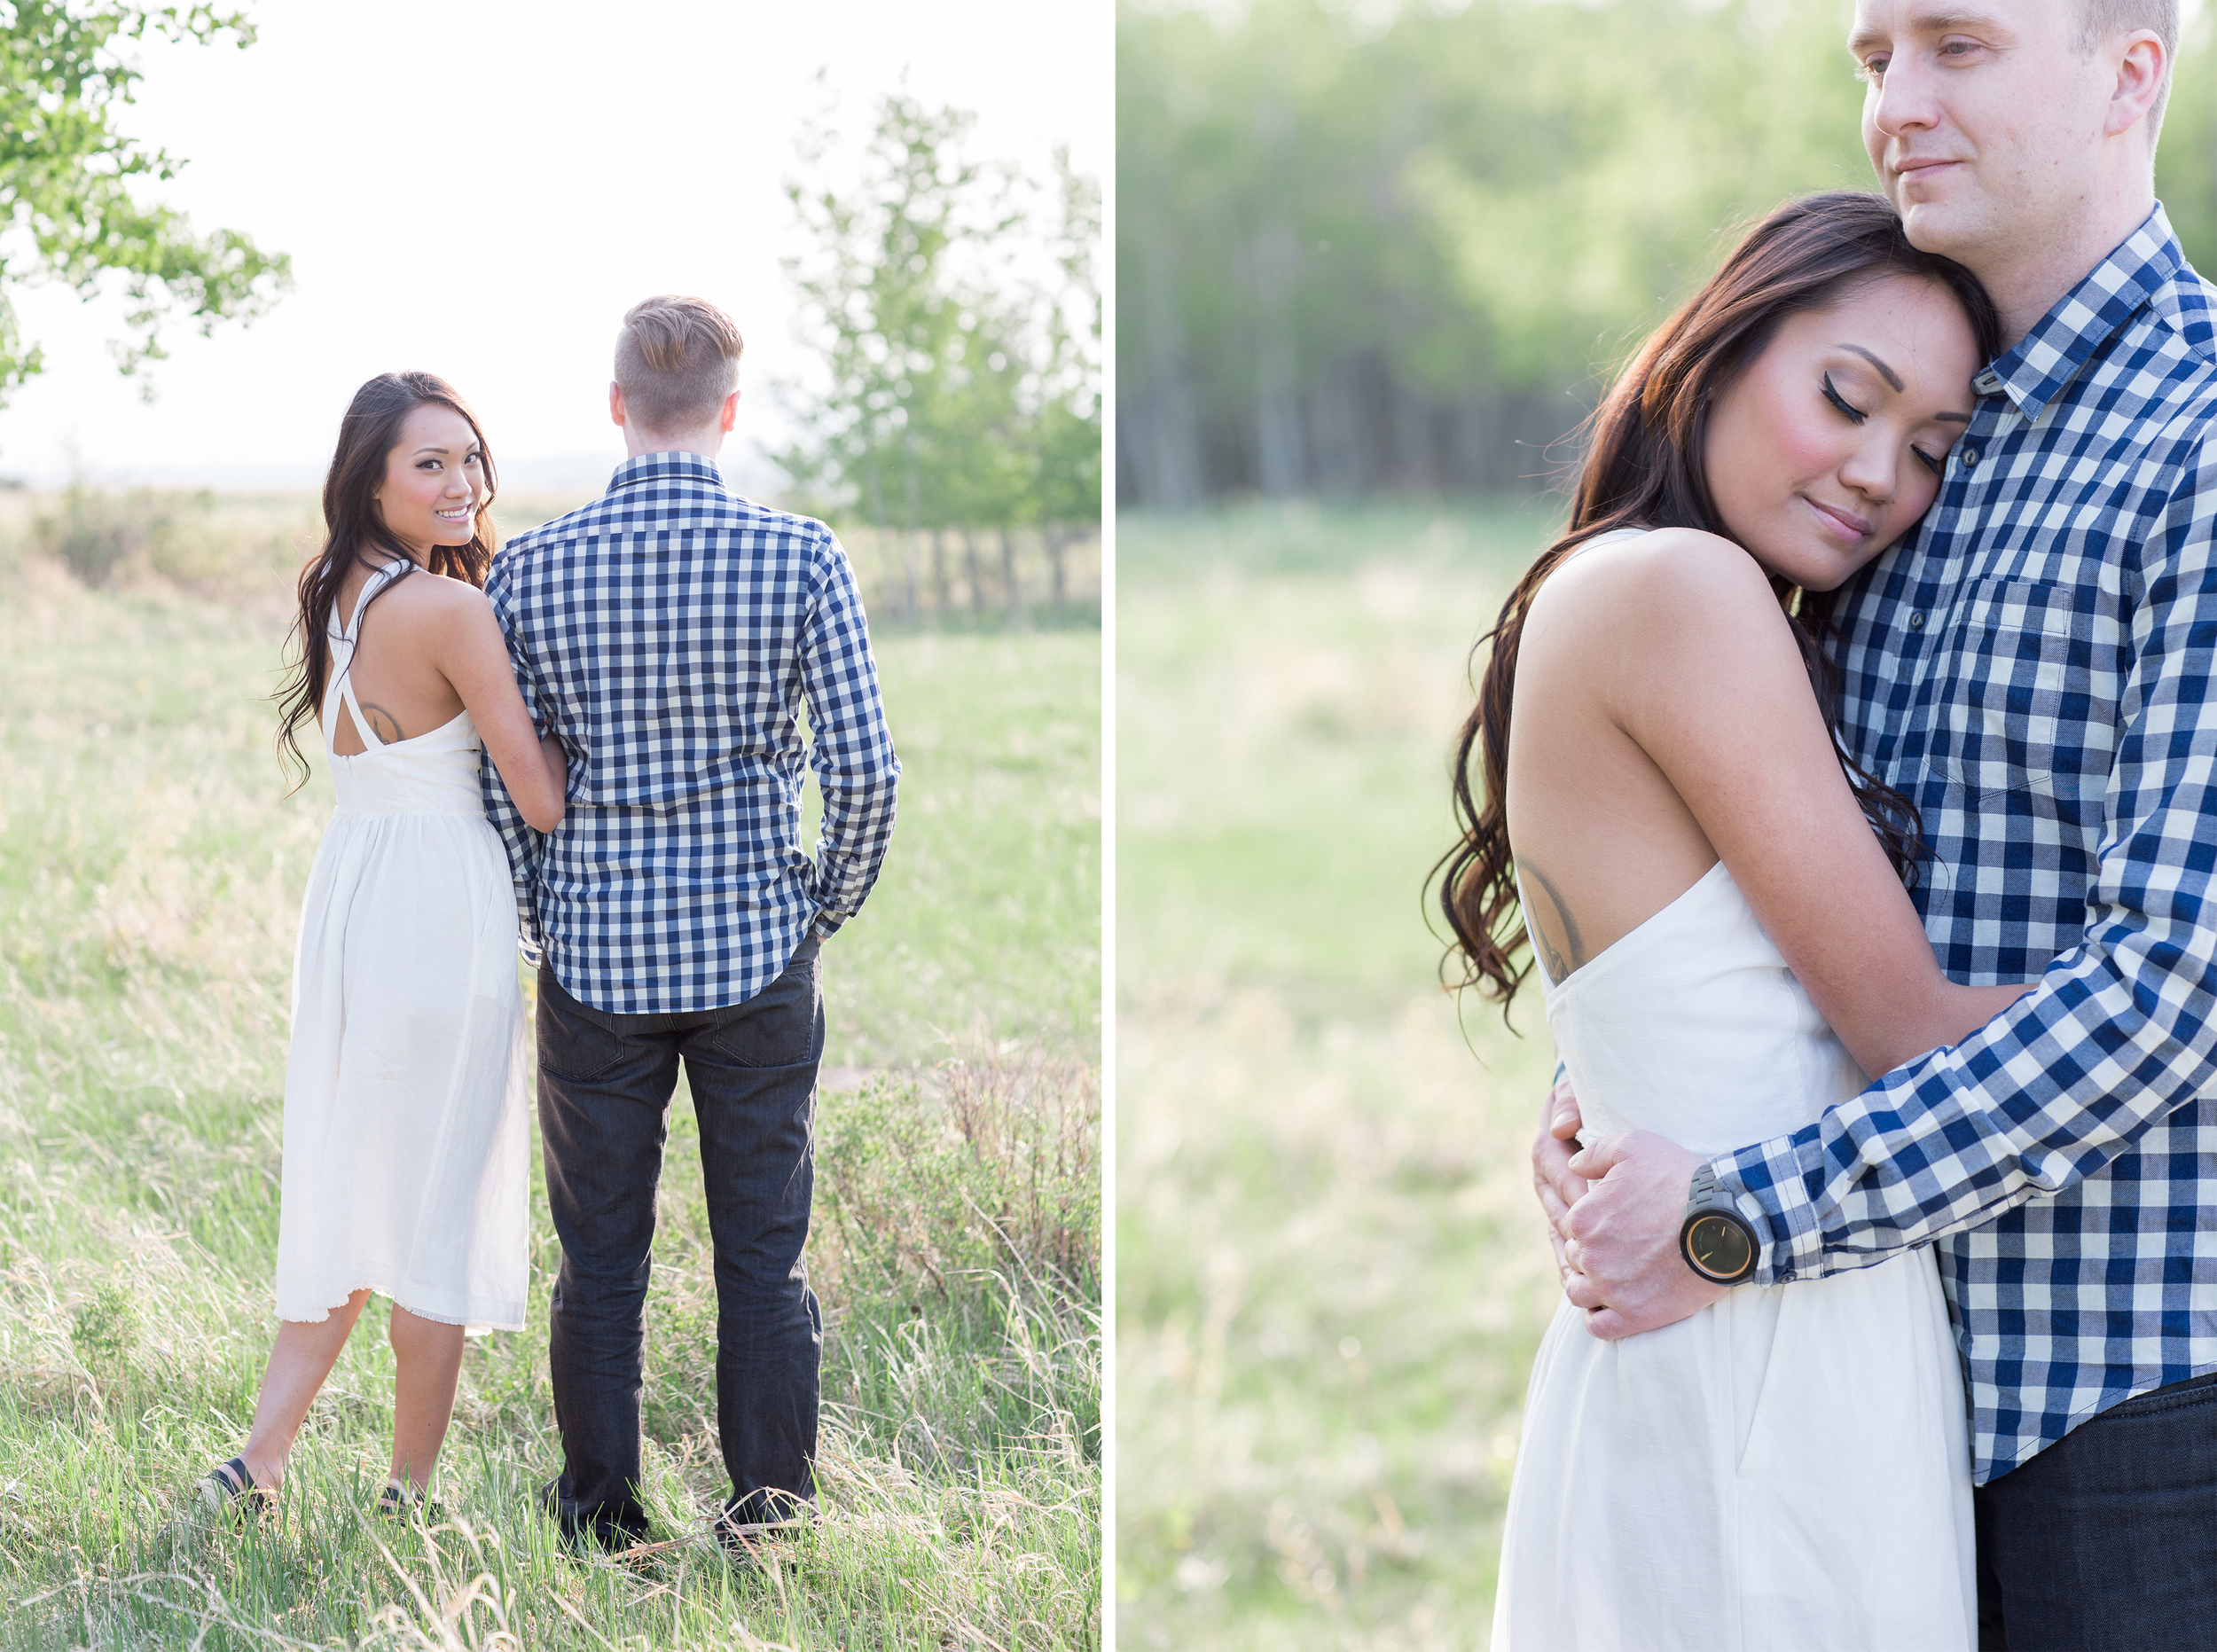 EngagementPhotography_ParrishHousePhotos_StefanieShawn_13_SEt.jpg